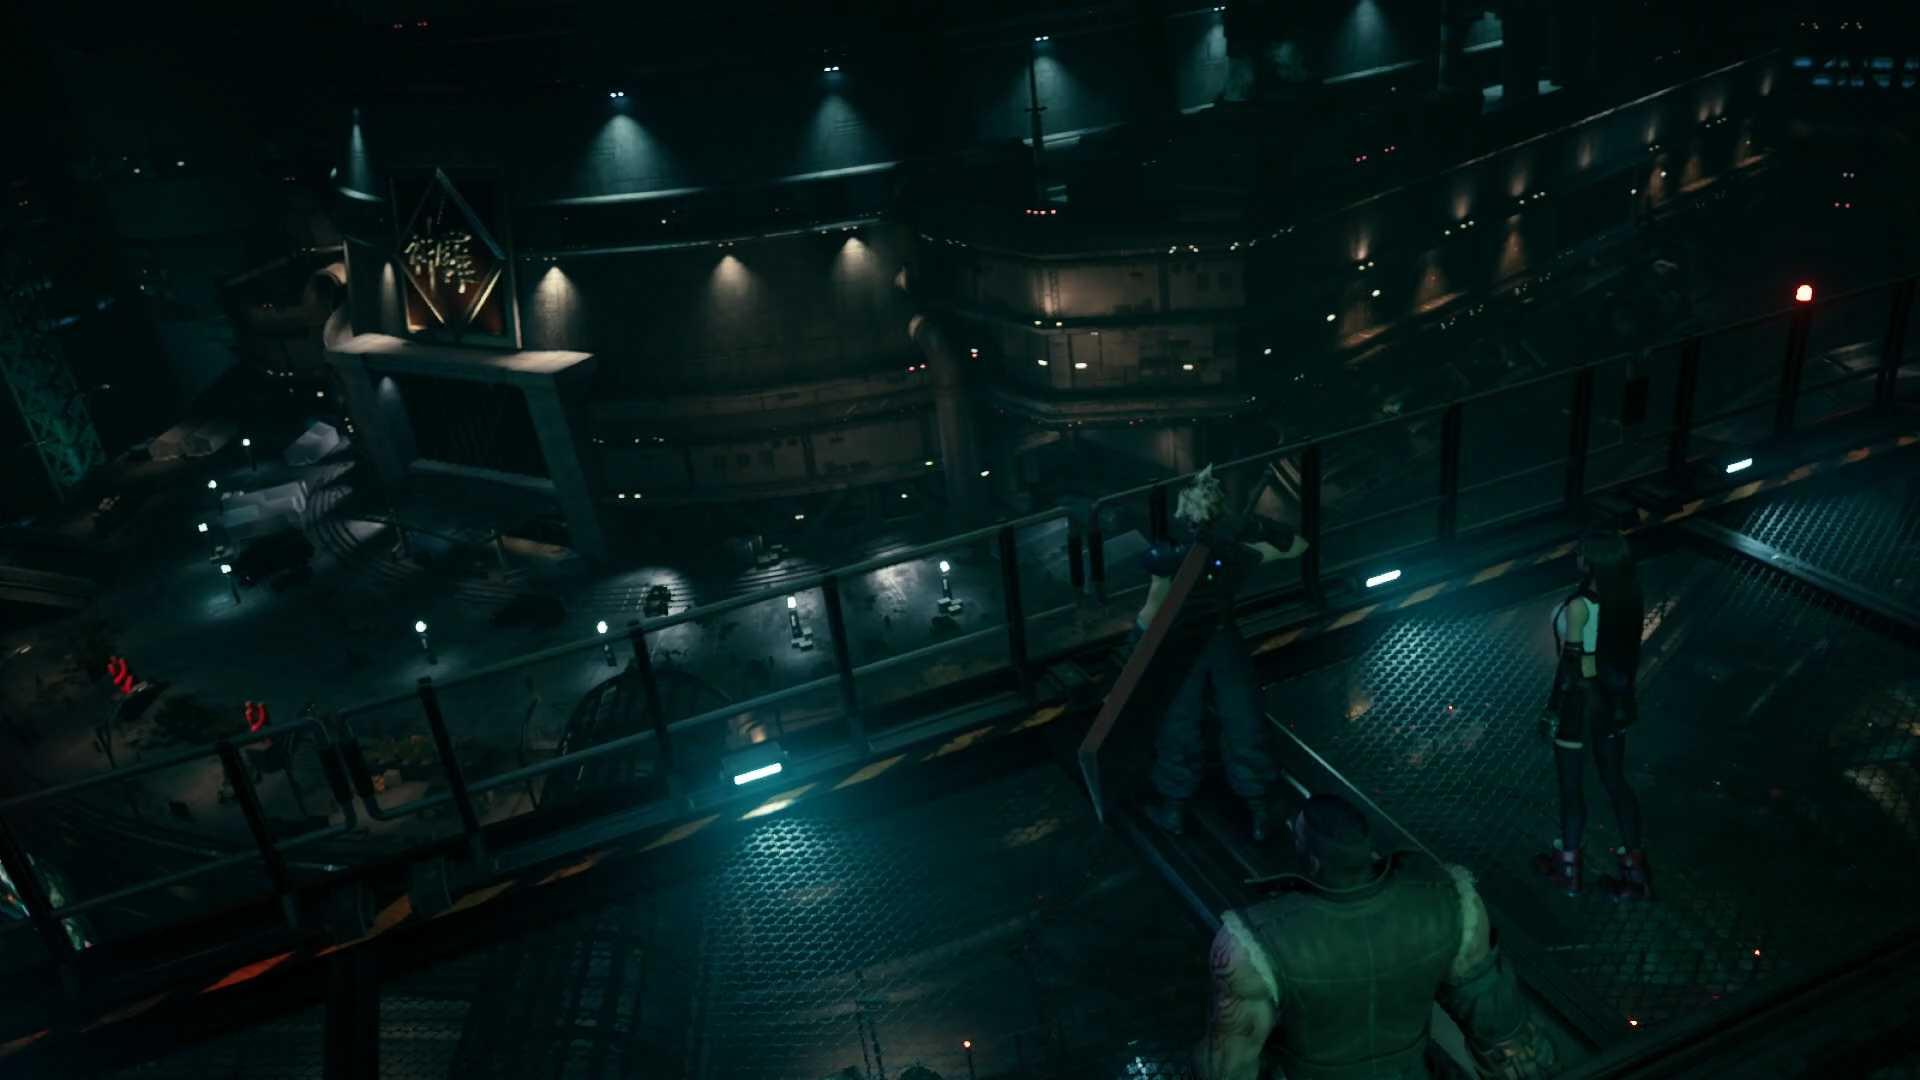 Final Fantasy 7 Remake Screenshot 1